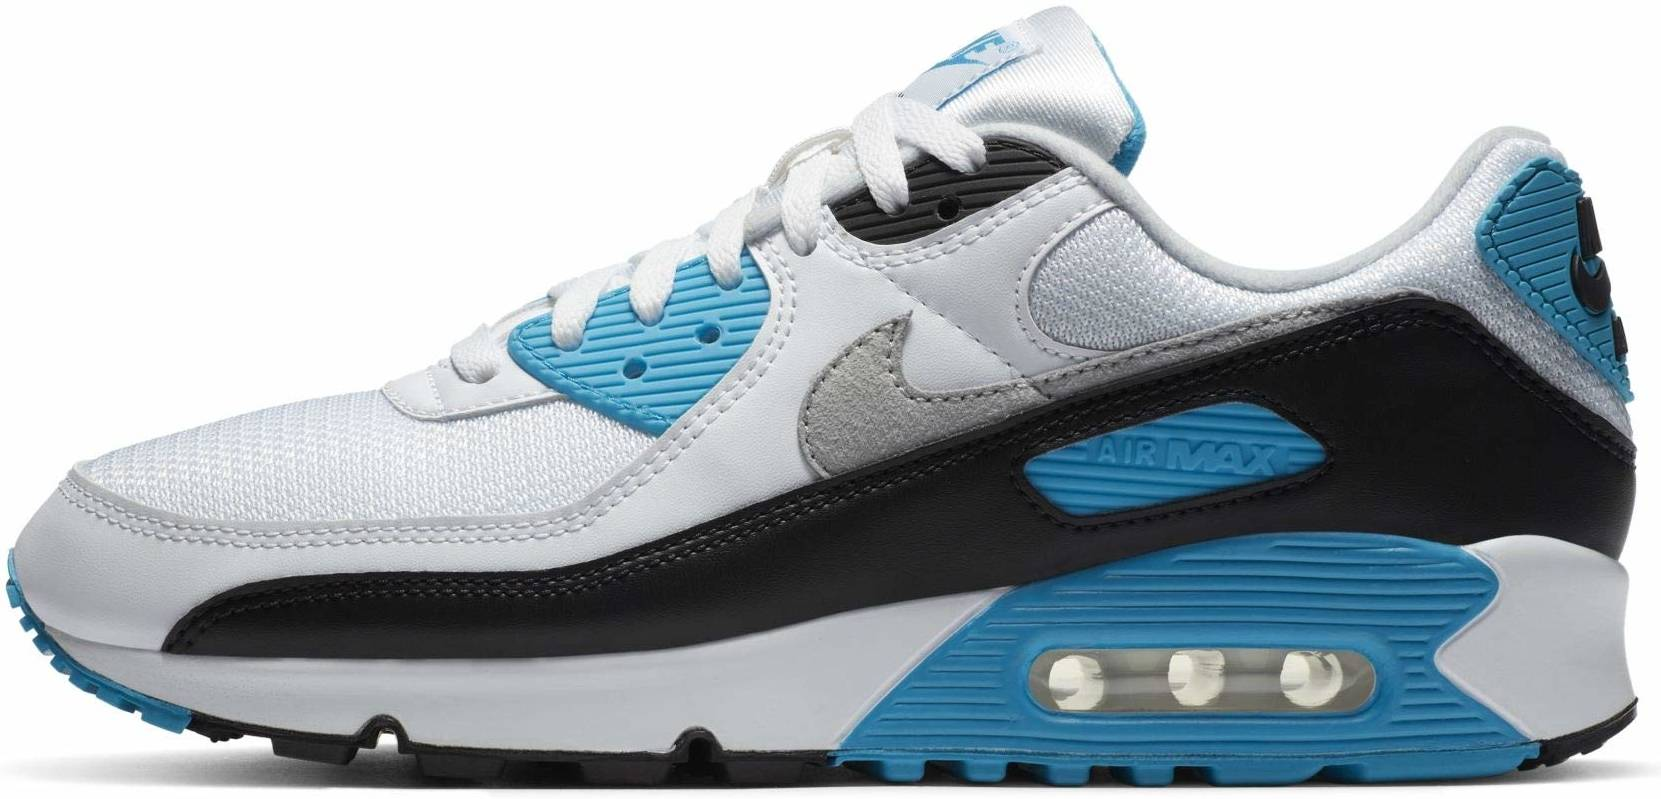 Nike Air Max 3 sneakers in 3 colors (only $90) | RunRepeat